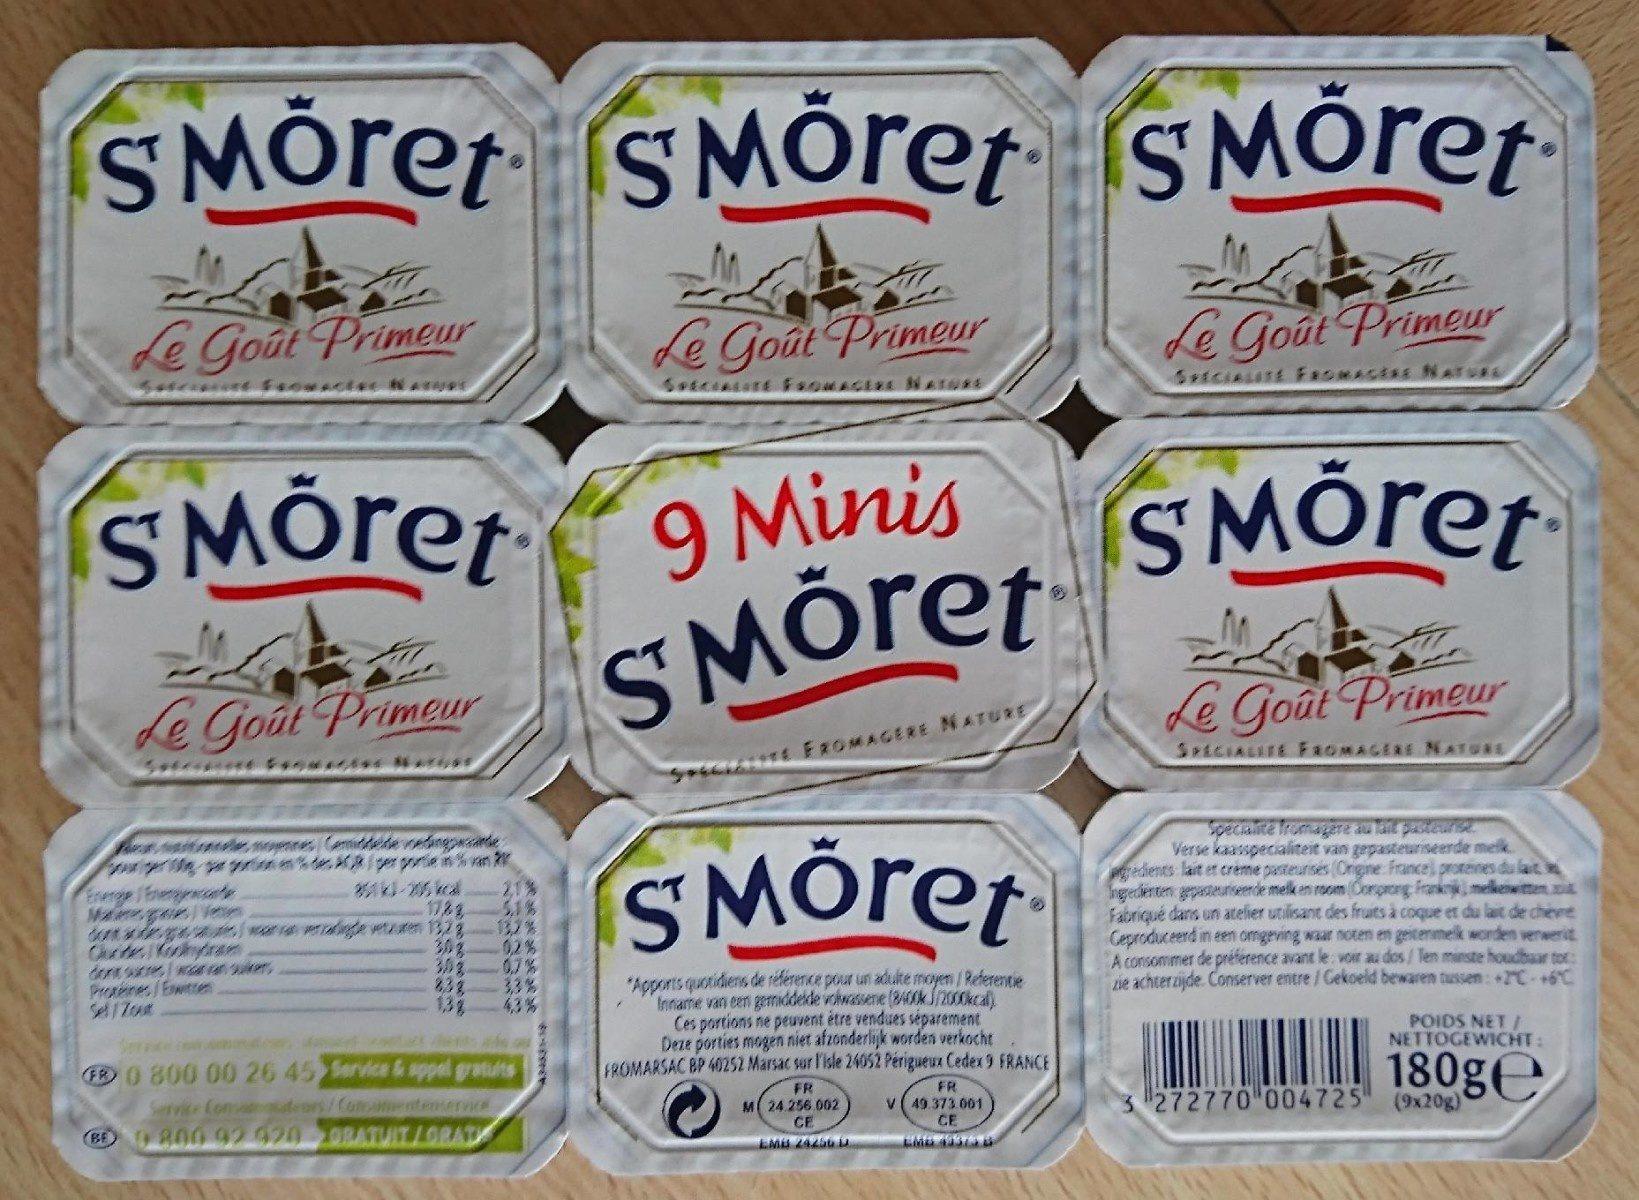 9 Minis St Moret (17,8% MG) - Product - fr